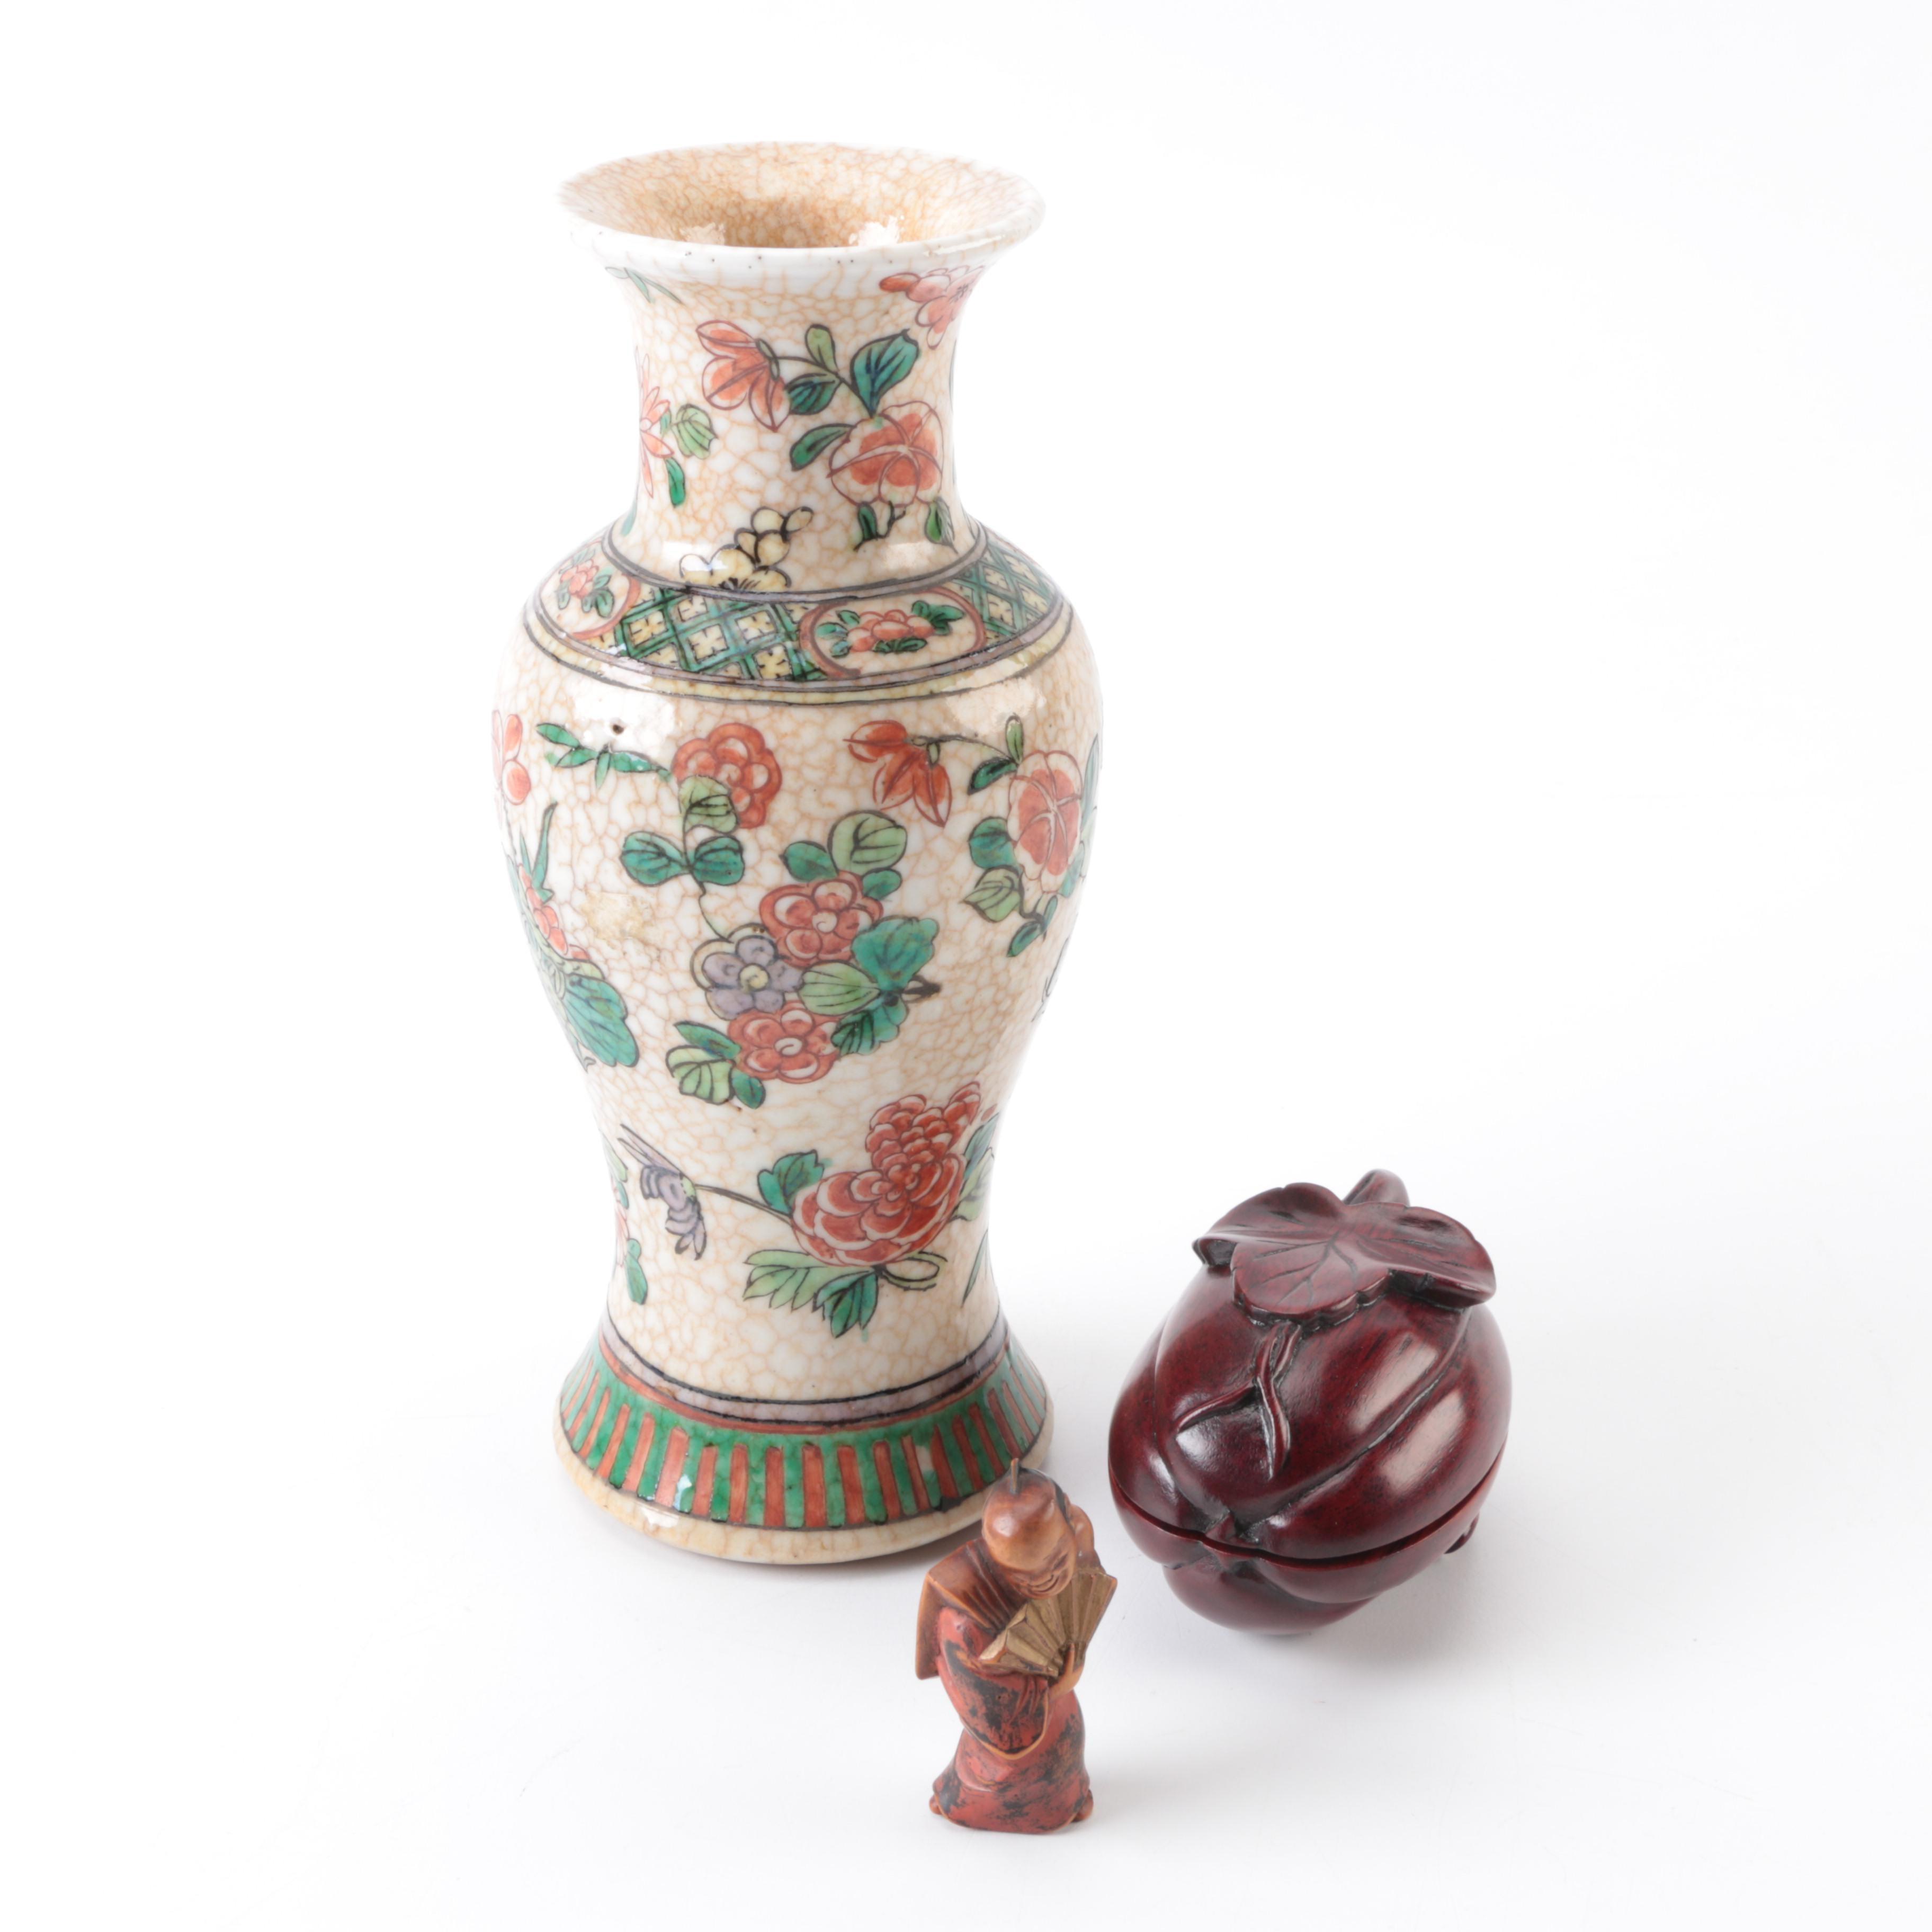 Chinese Ceramic Vase and Wooden Trinket Box